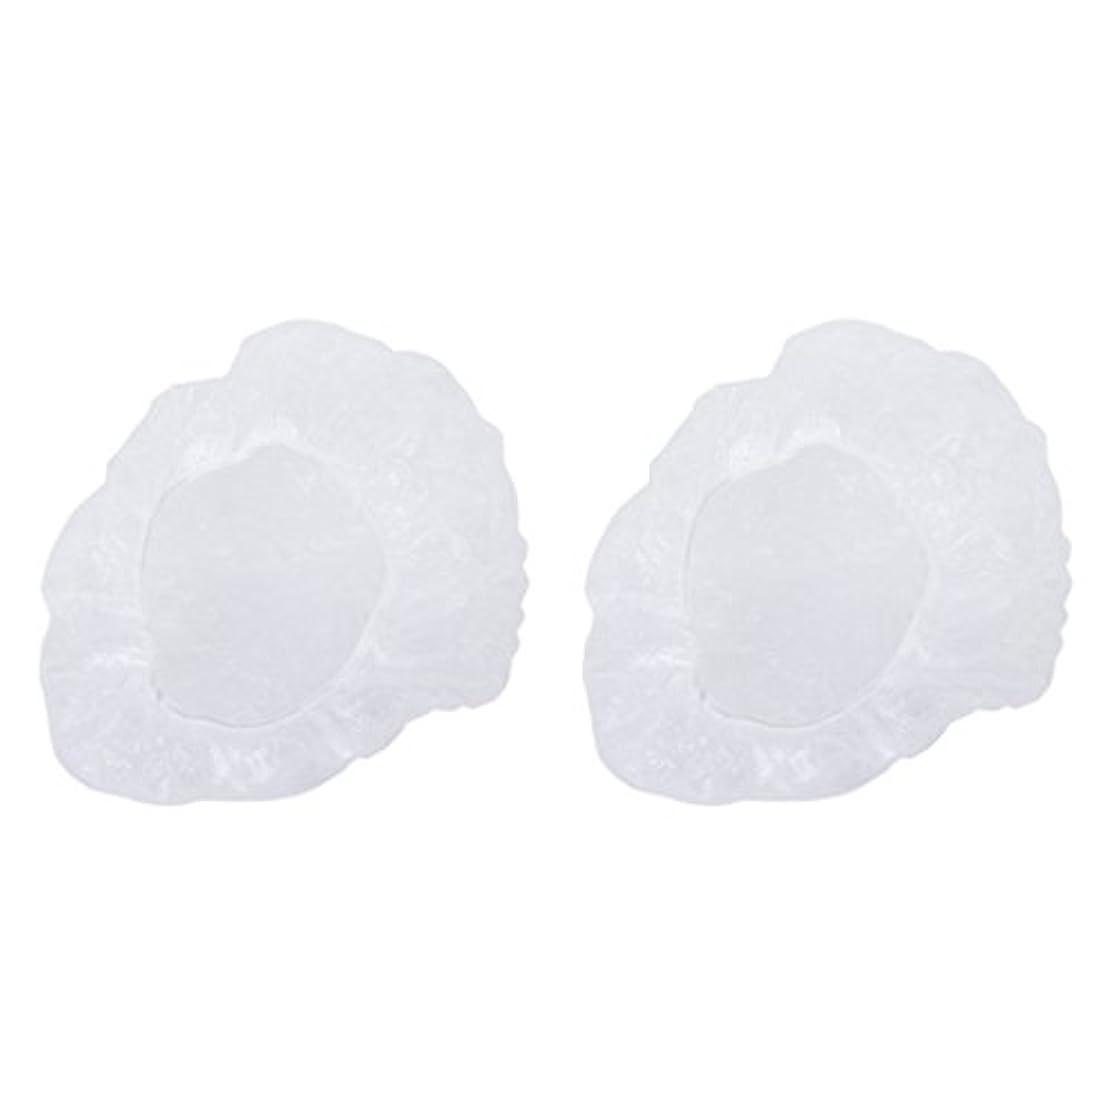 Perfk お買い得 ポリエチレン シャワーキャップ カバー 使い捨て プラスチック製  シャンプーハット 透明 200枚